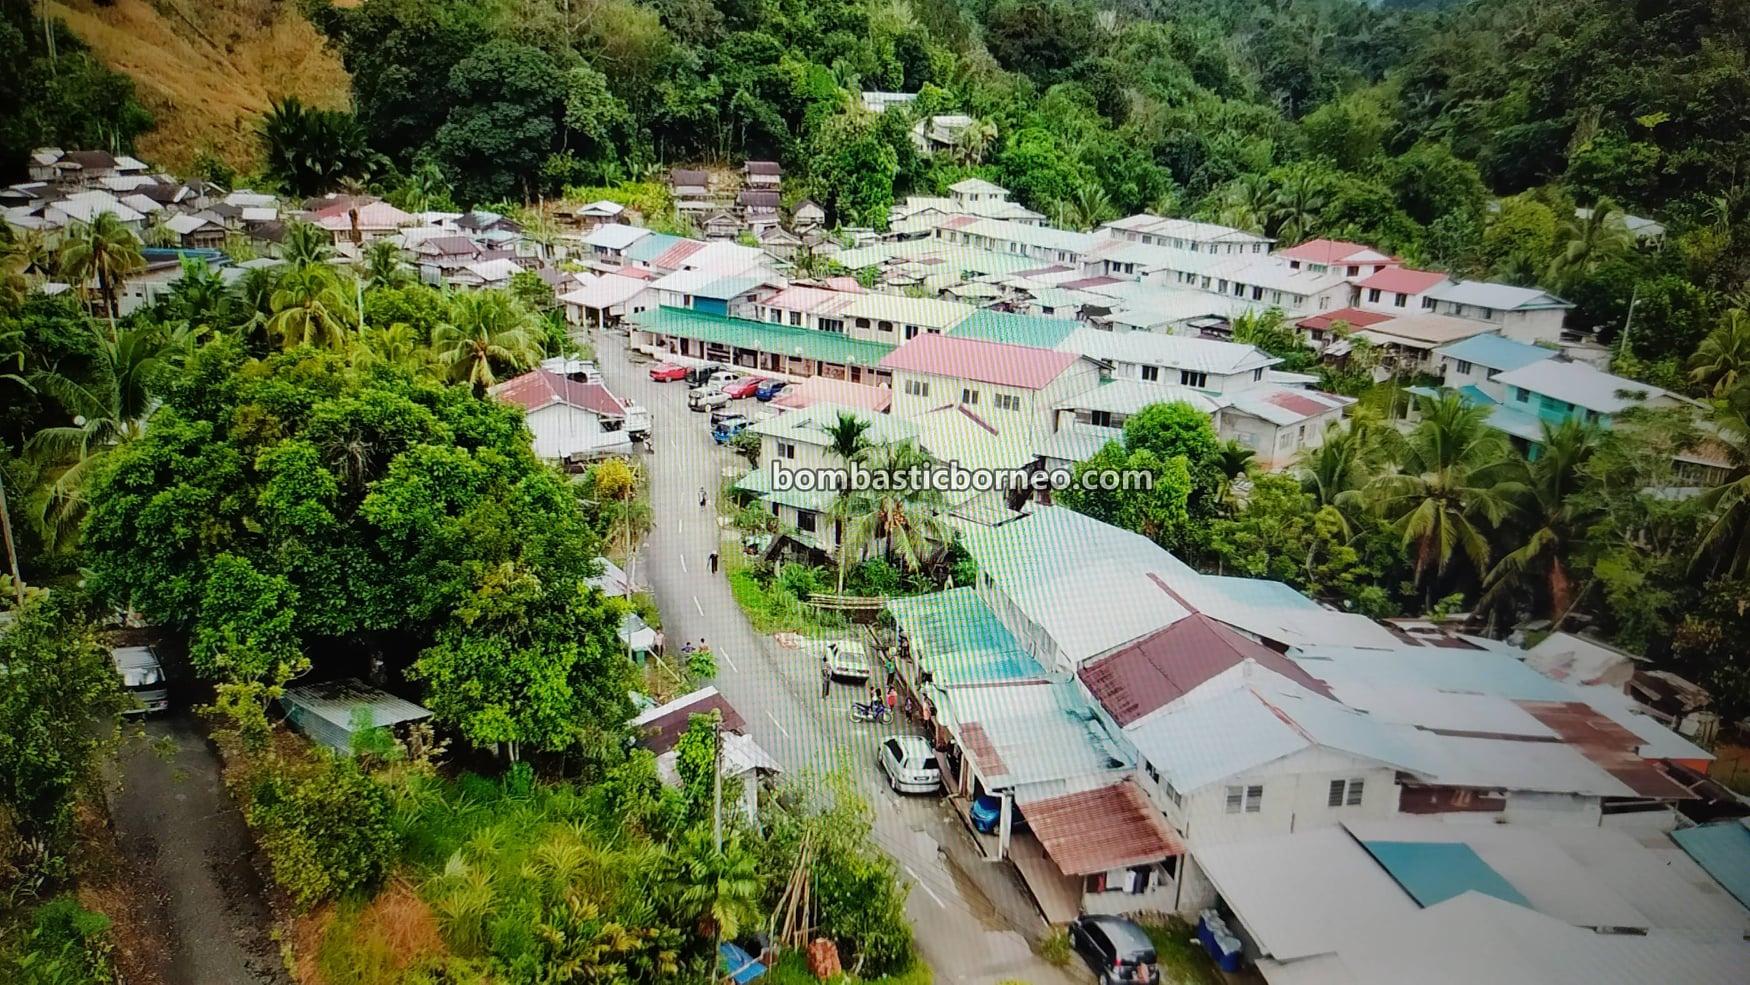 Dayak Bidayuh, village, authentic, Traditional, native, destination, exploration, Tourism, tourist attraction, travel guide, Trans Borneo, 穿越探索婆罗洲游踪, 马来西亚西连, 砂拉越比达友乡村